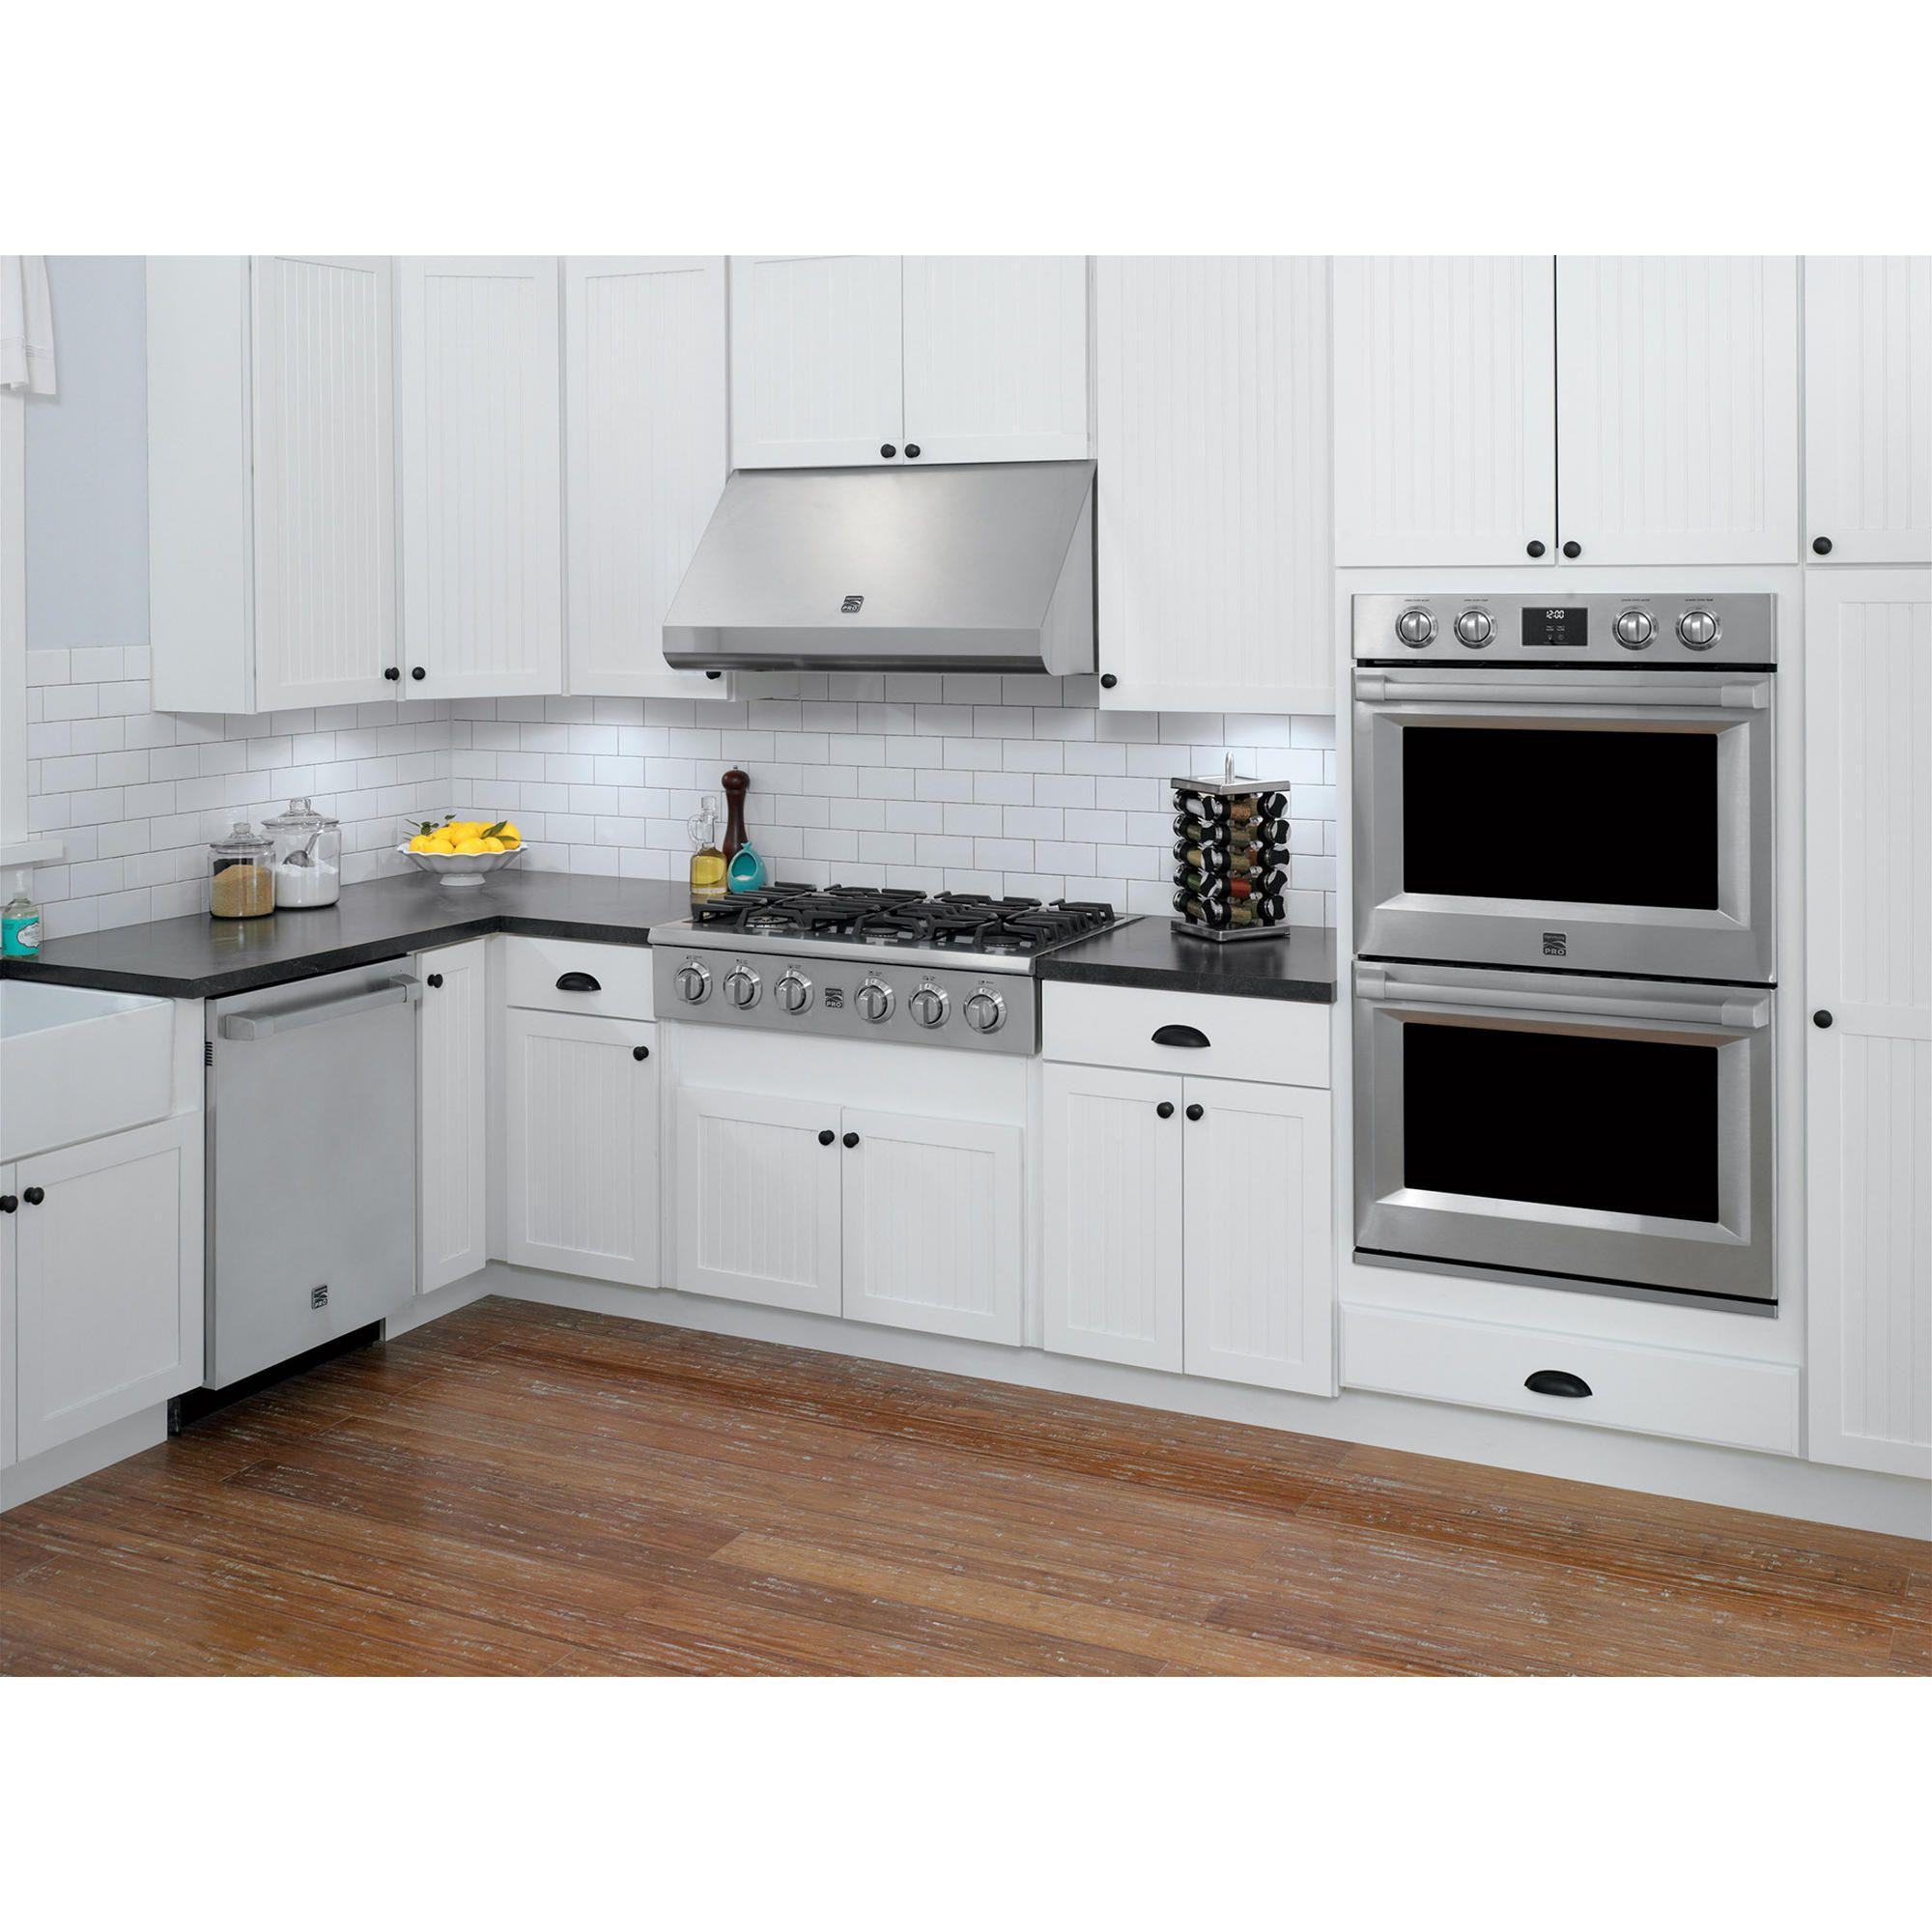 Contemporary Kitchen, Gas Cooktop, Cooktop